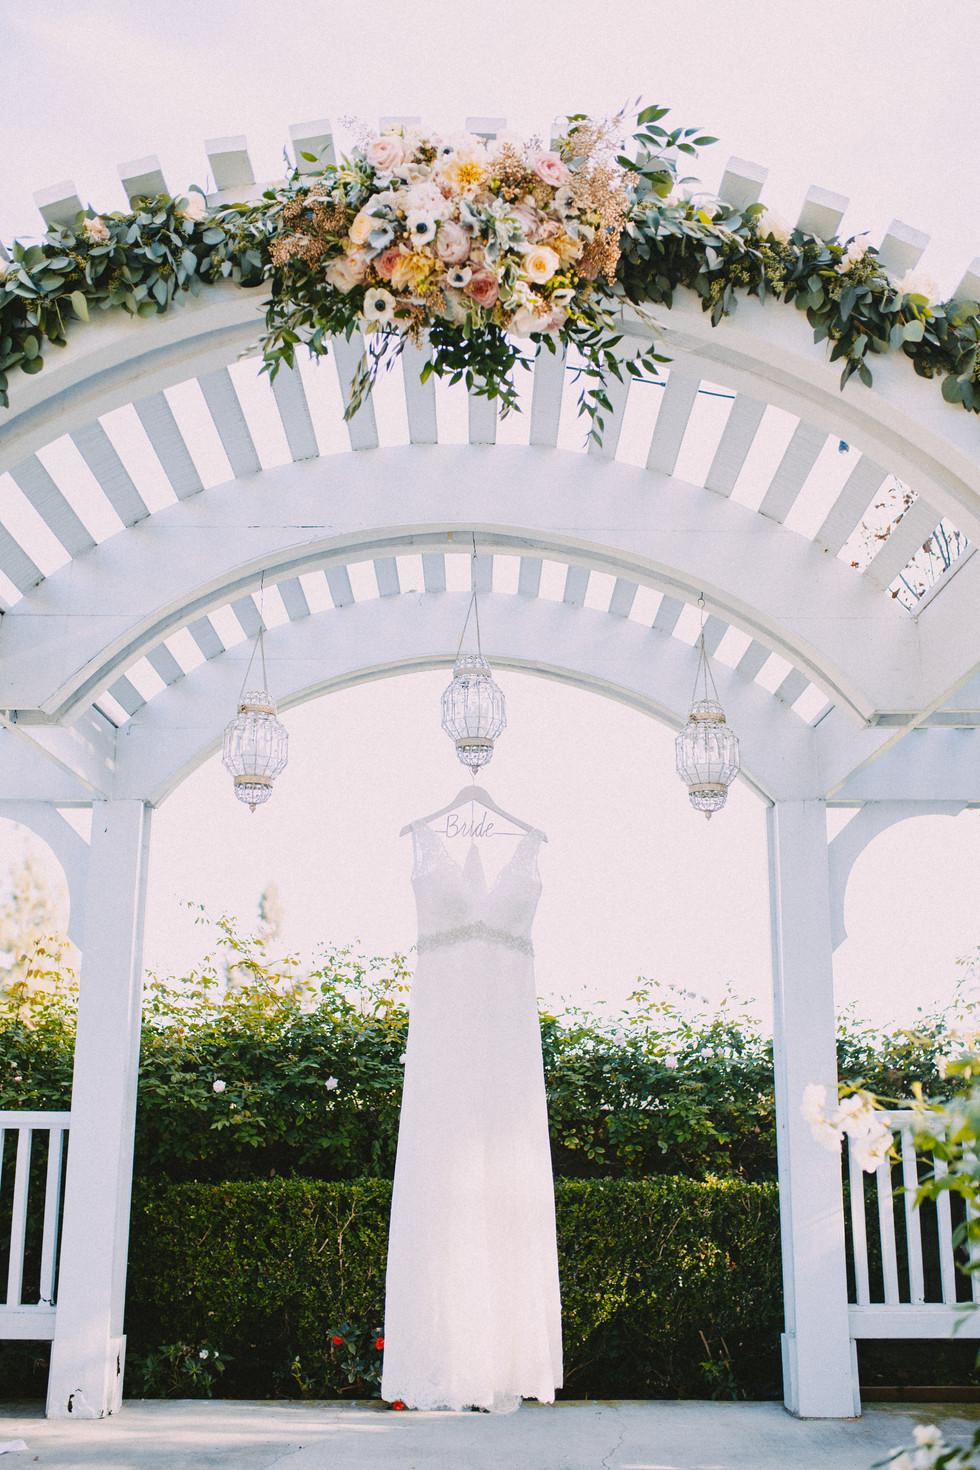 Weddings-NE-152941.jpg